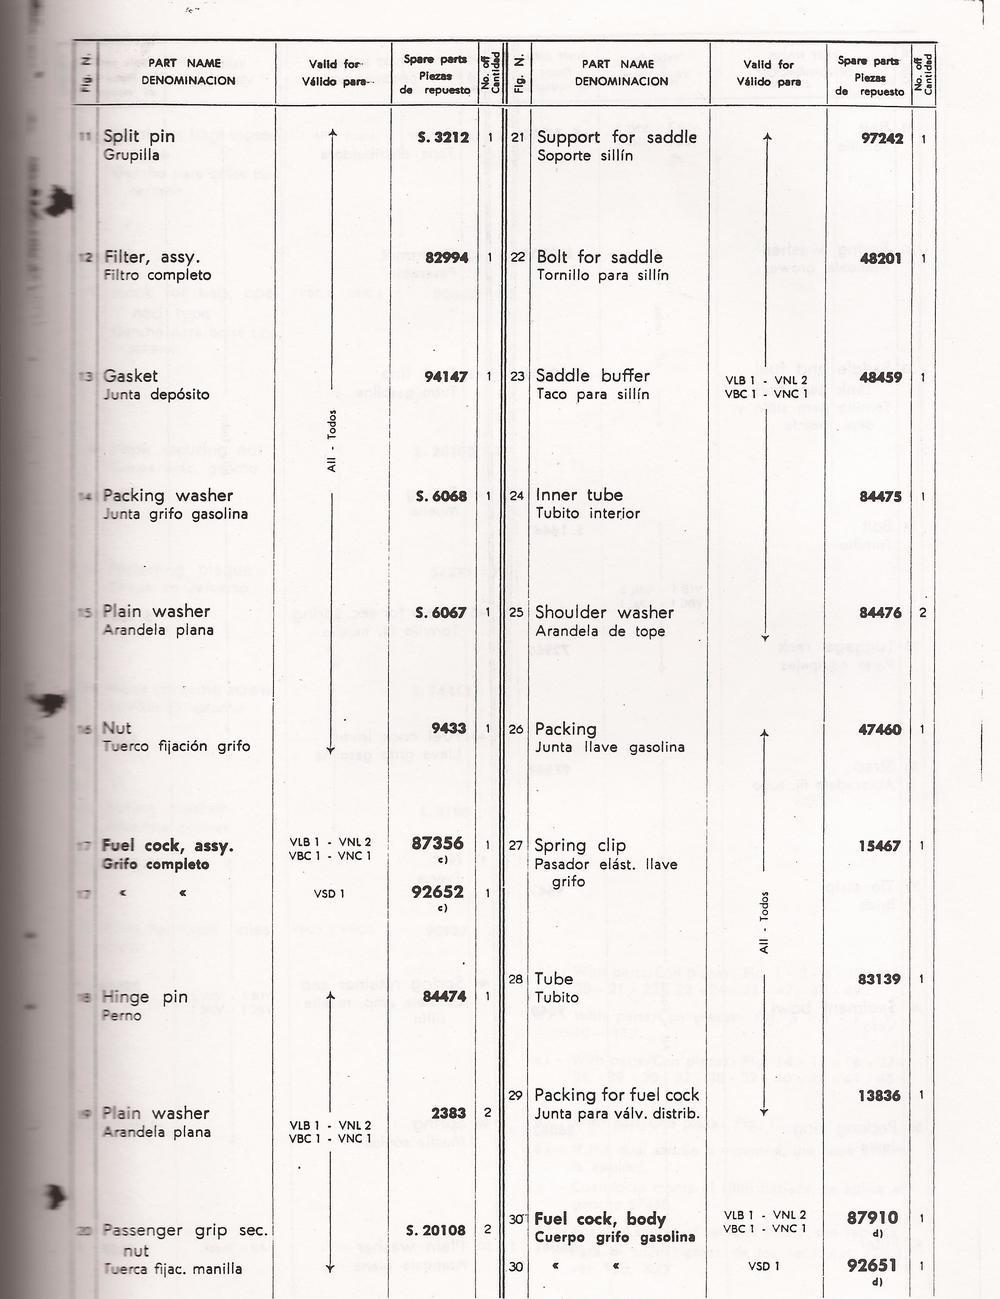 02-25-2013 vespa manaul 27.jpg